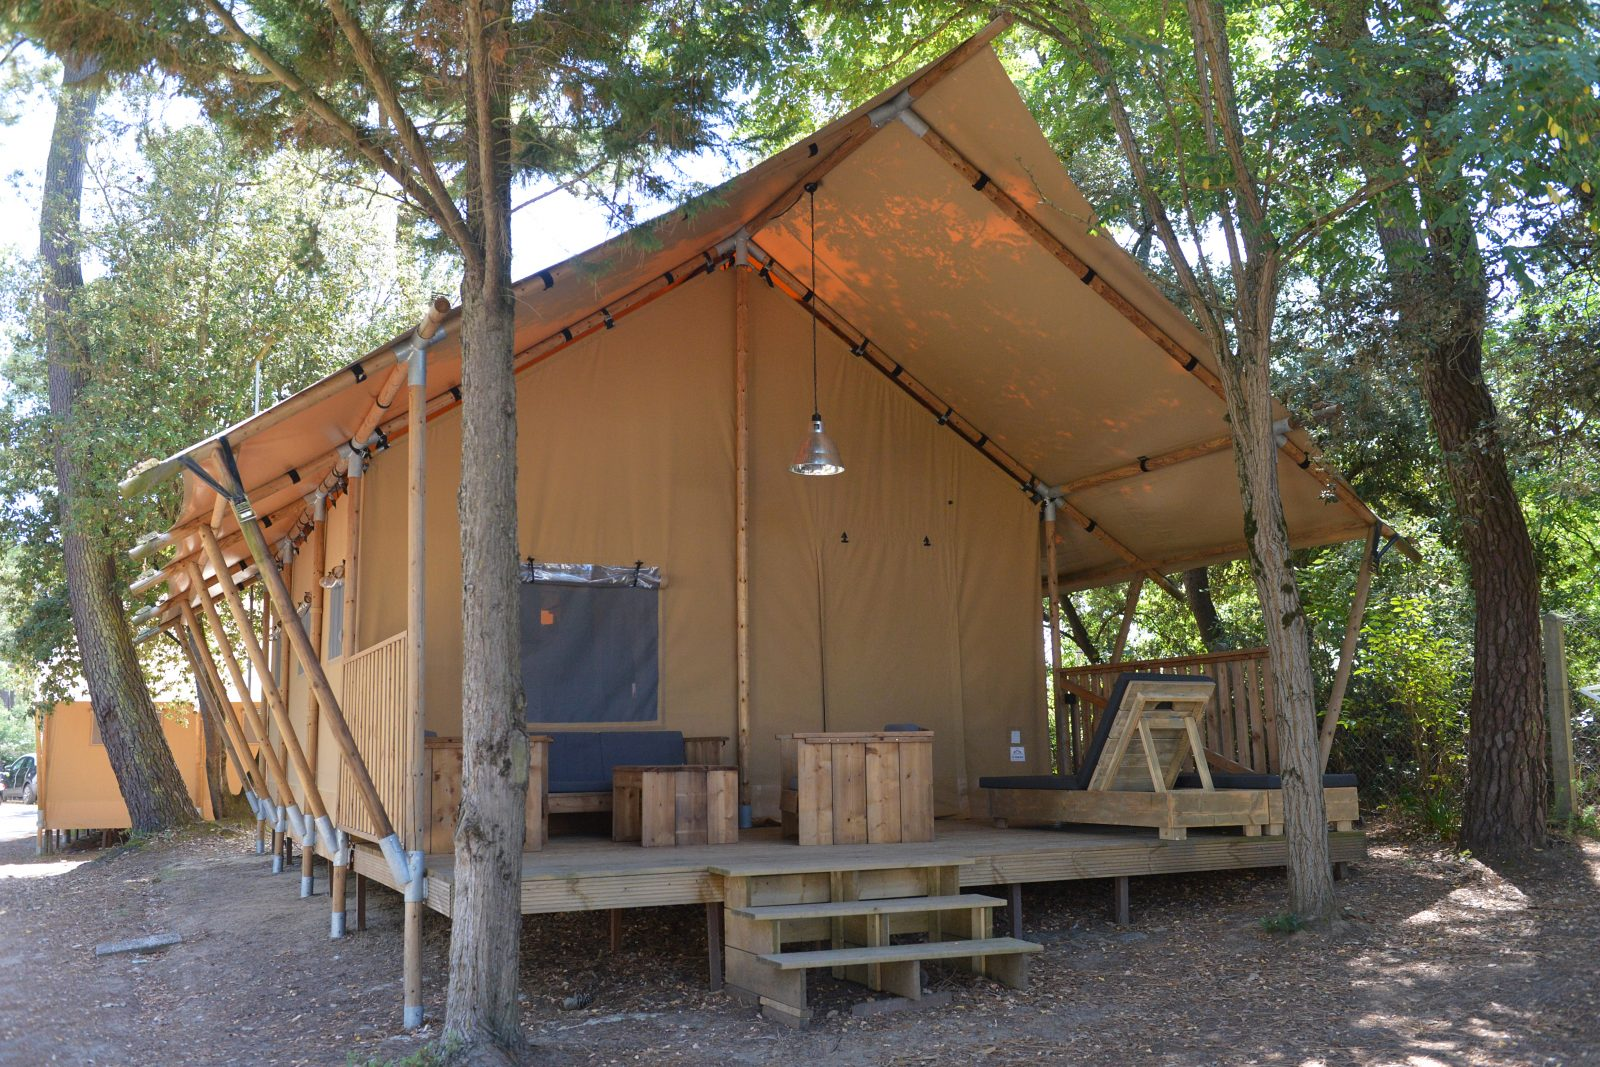 Camping_Les_Pins_35_HD_©X.Renaudin_DSC_6016